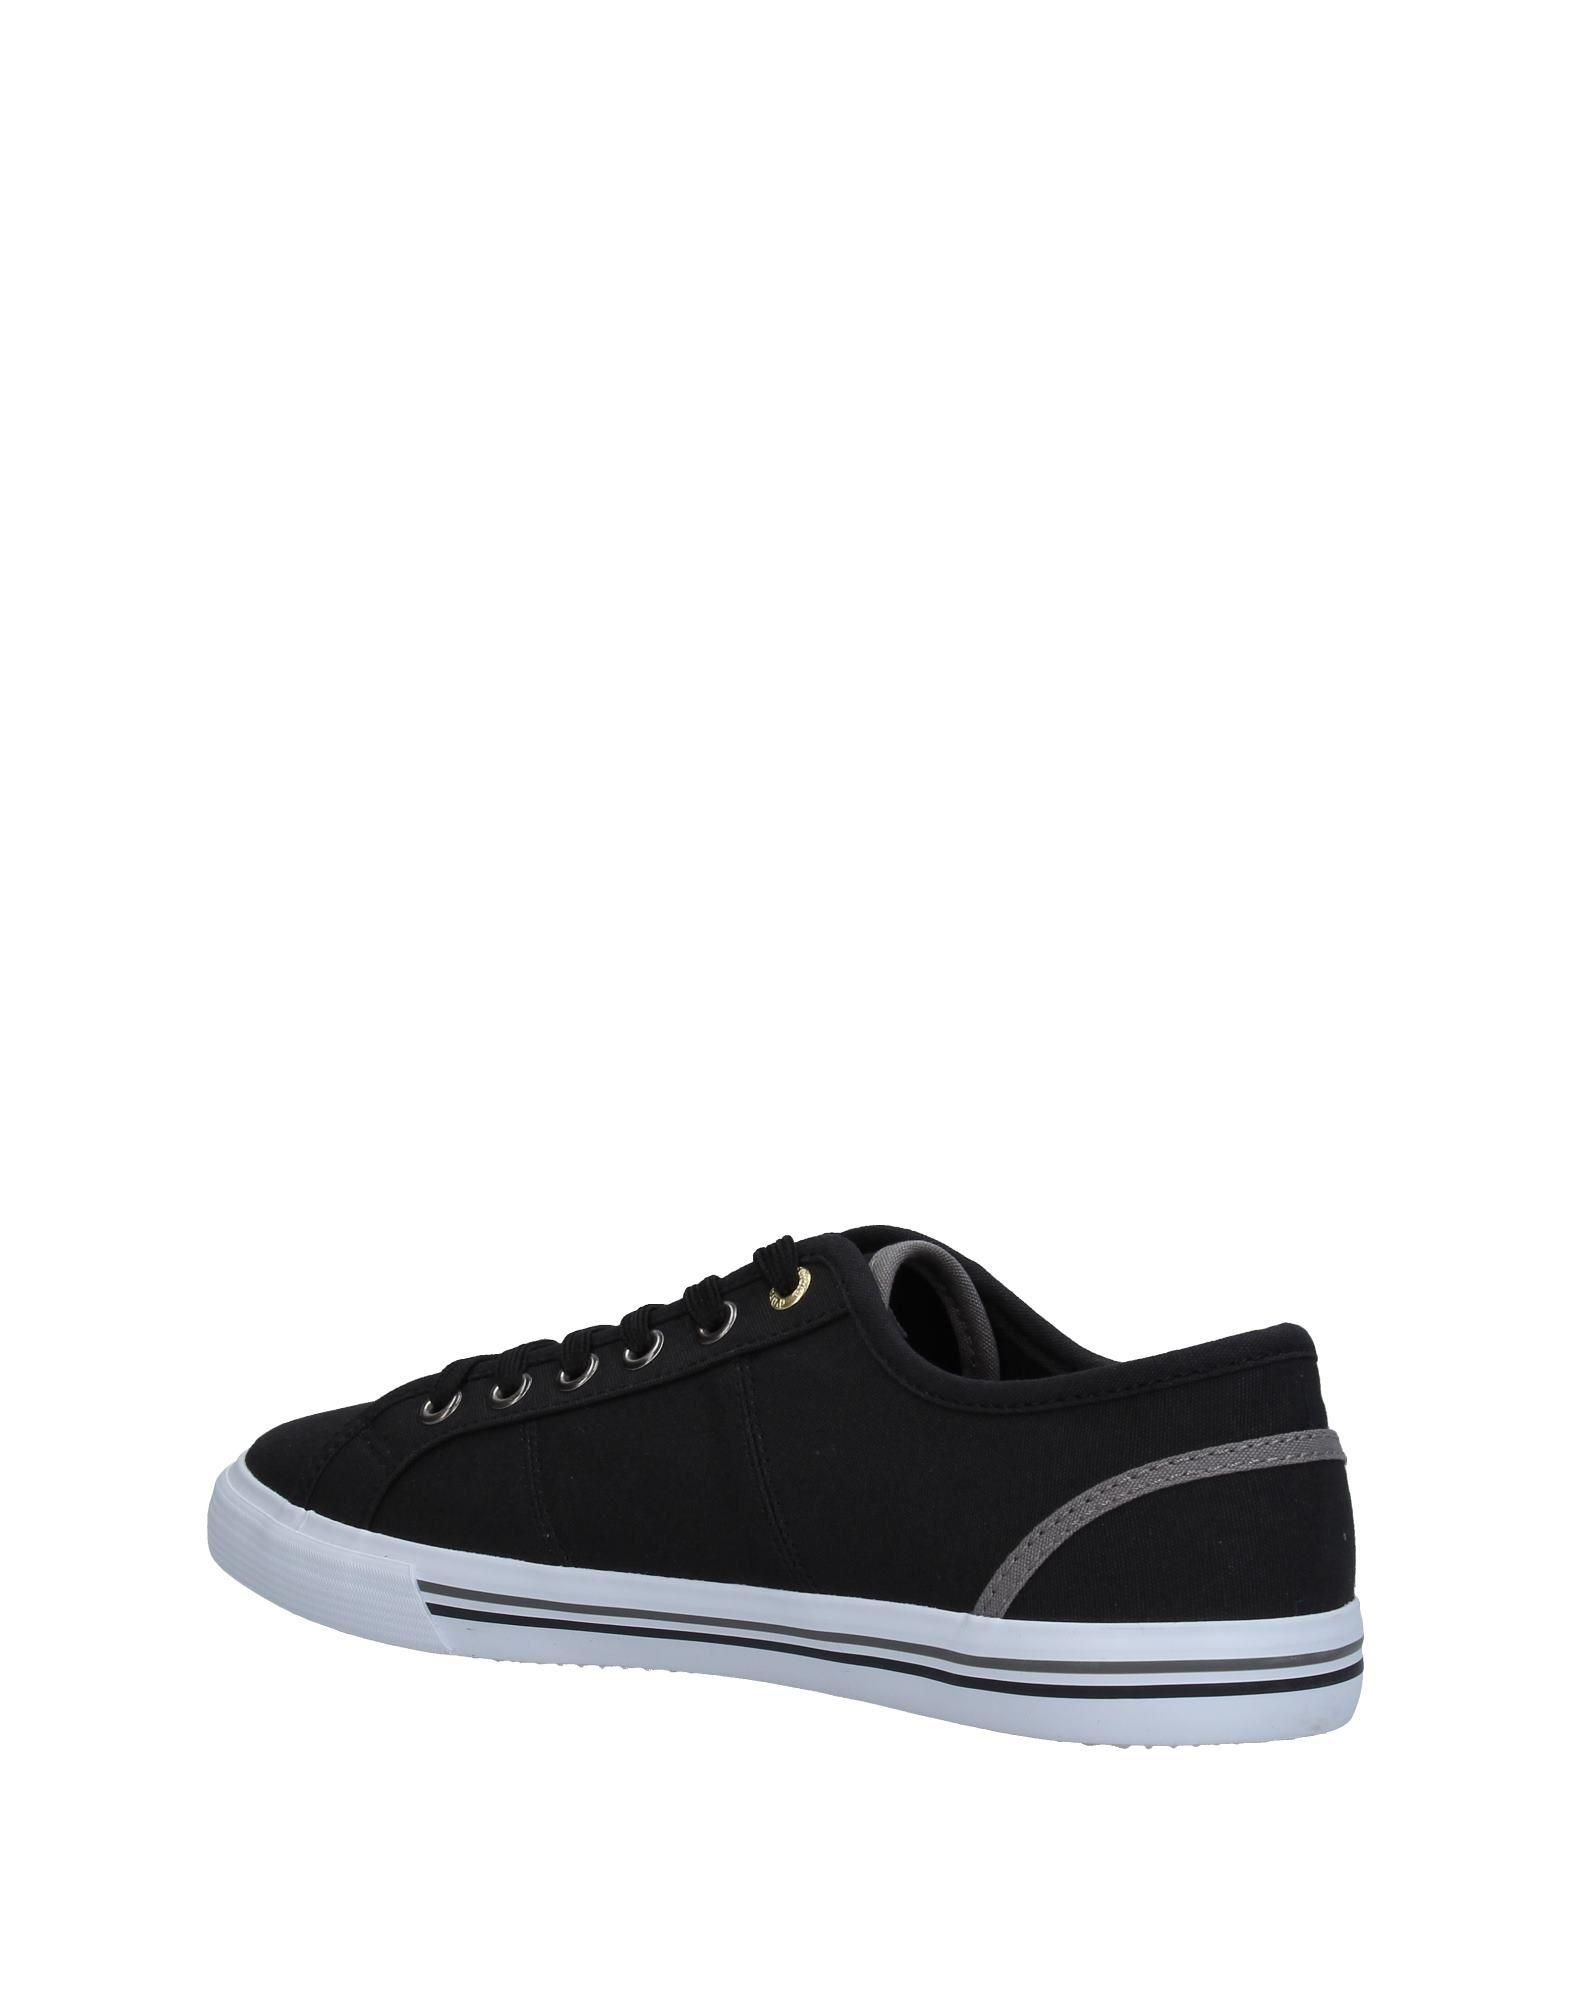 Pantofola Pantofola Pantofola D'oro Sneakers Herren  11338483EQ Neue Schuhe 2b5d9d